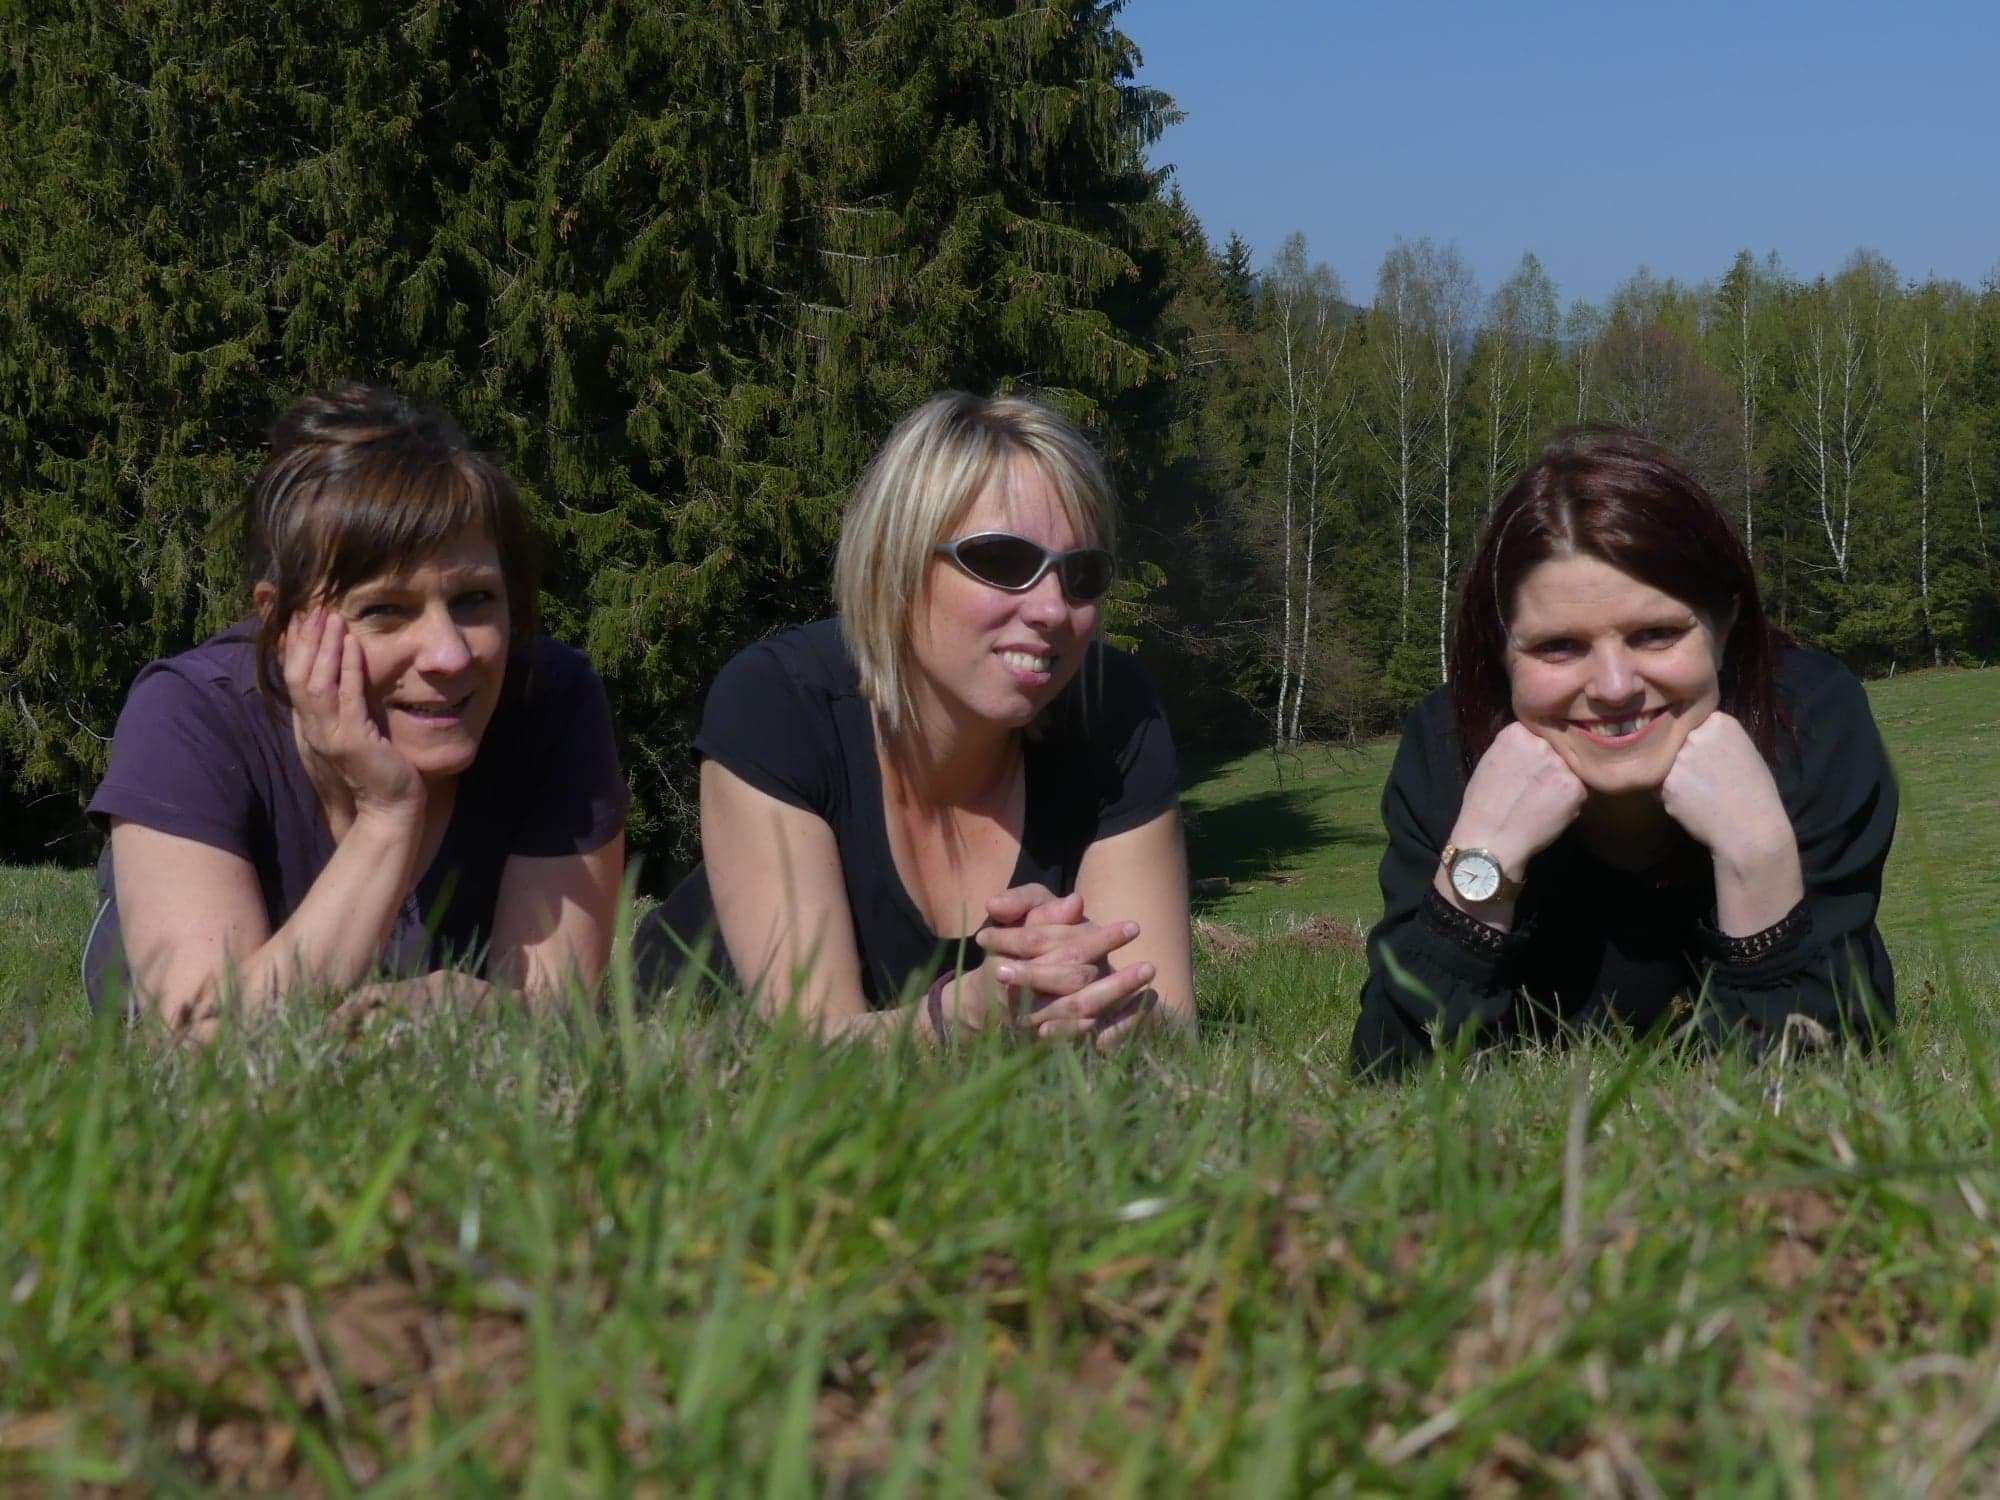 Françoise LEDIG, Audrey BERNARD, Priscilia KRAUSHAR